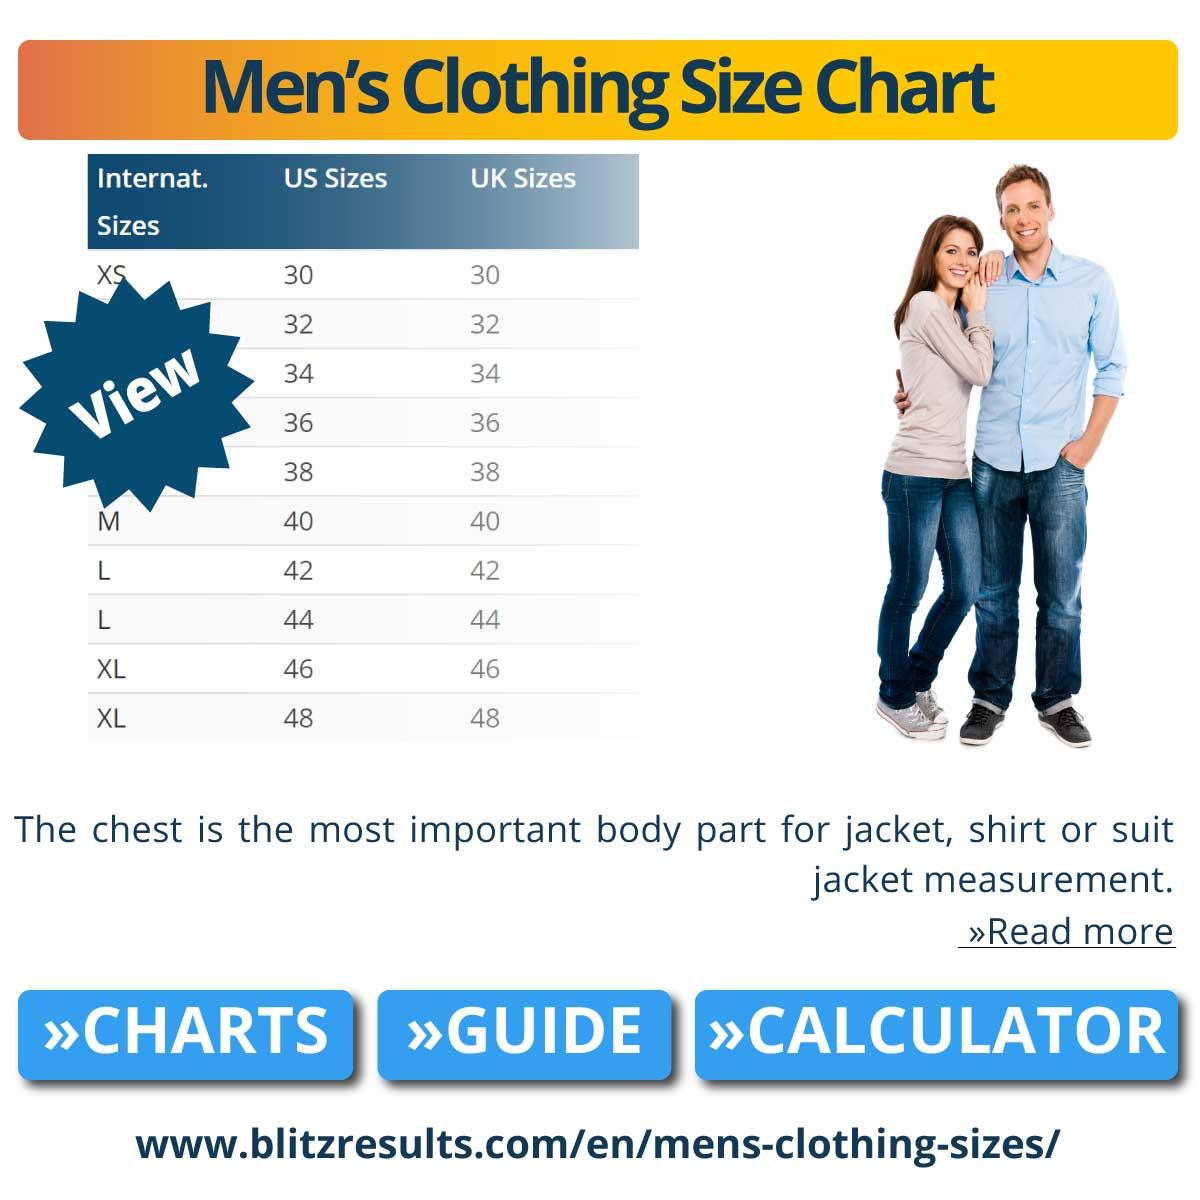 Men's Clothing Size Chart